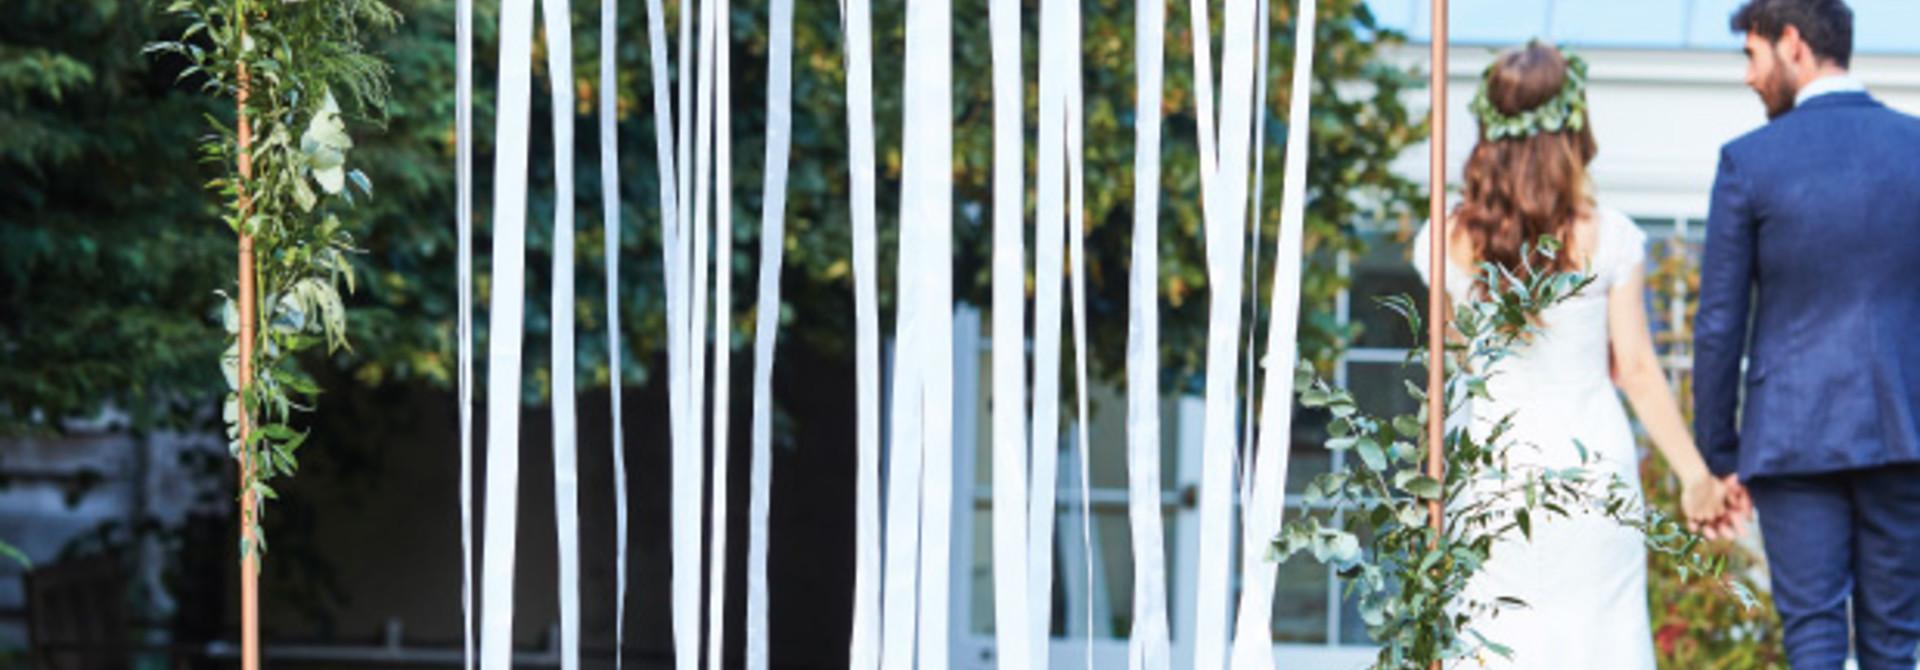 Backdrop witte linten (80M) Ginger Ray